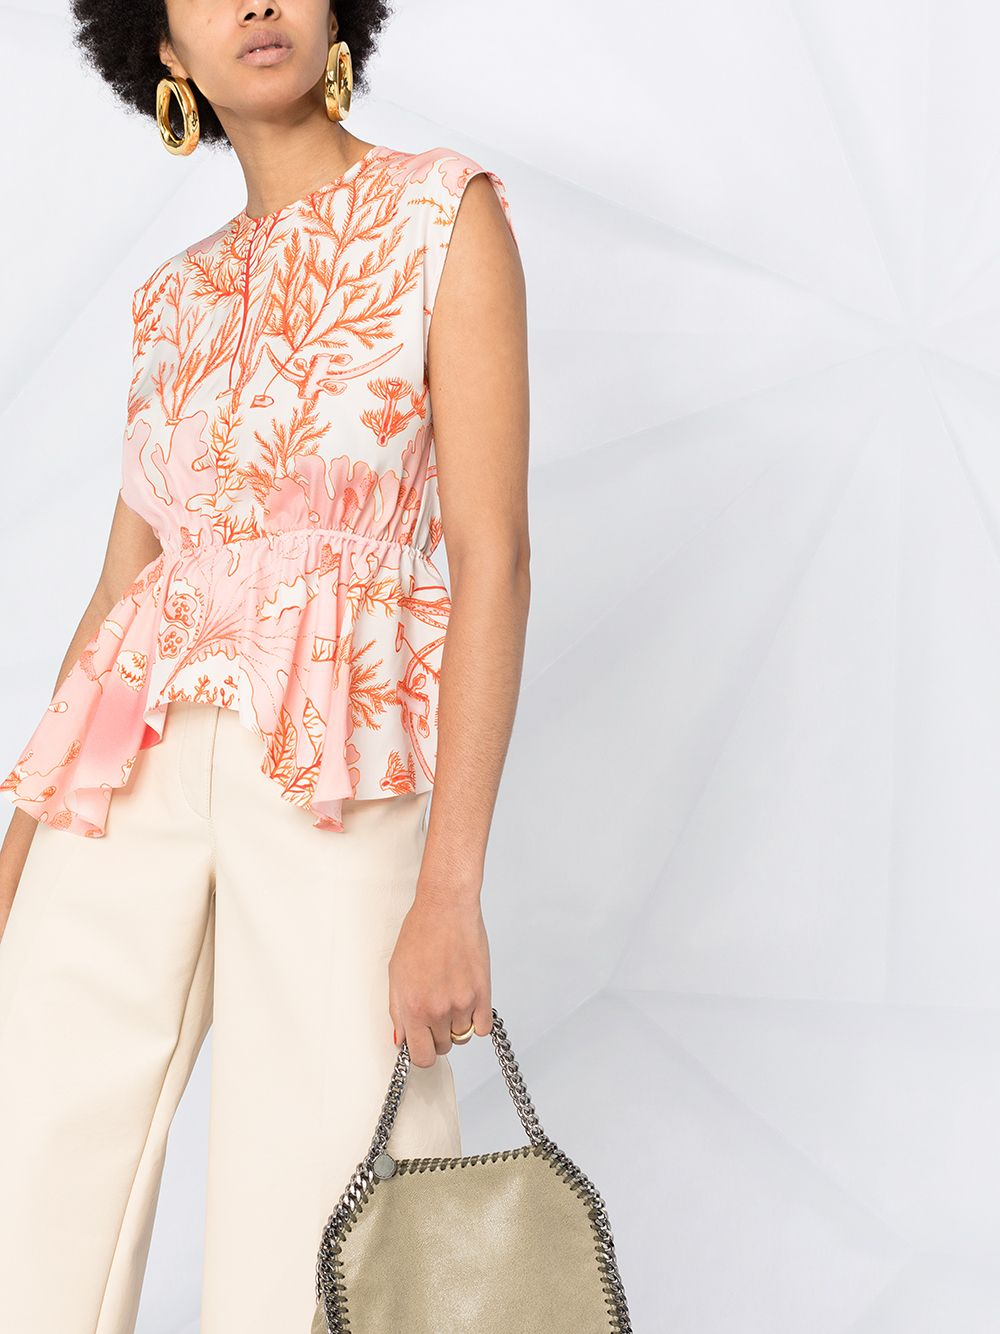 White and pink cotton coral-print peplum blouse  STELLA MC CARTNEY |  | 603123-SRA599515